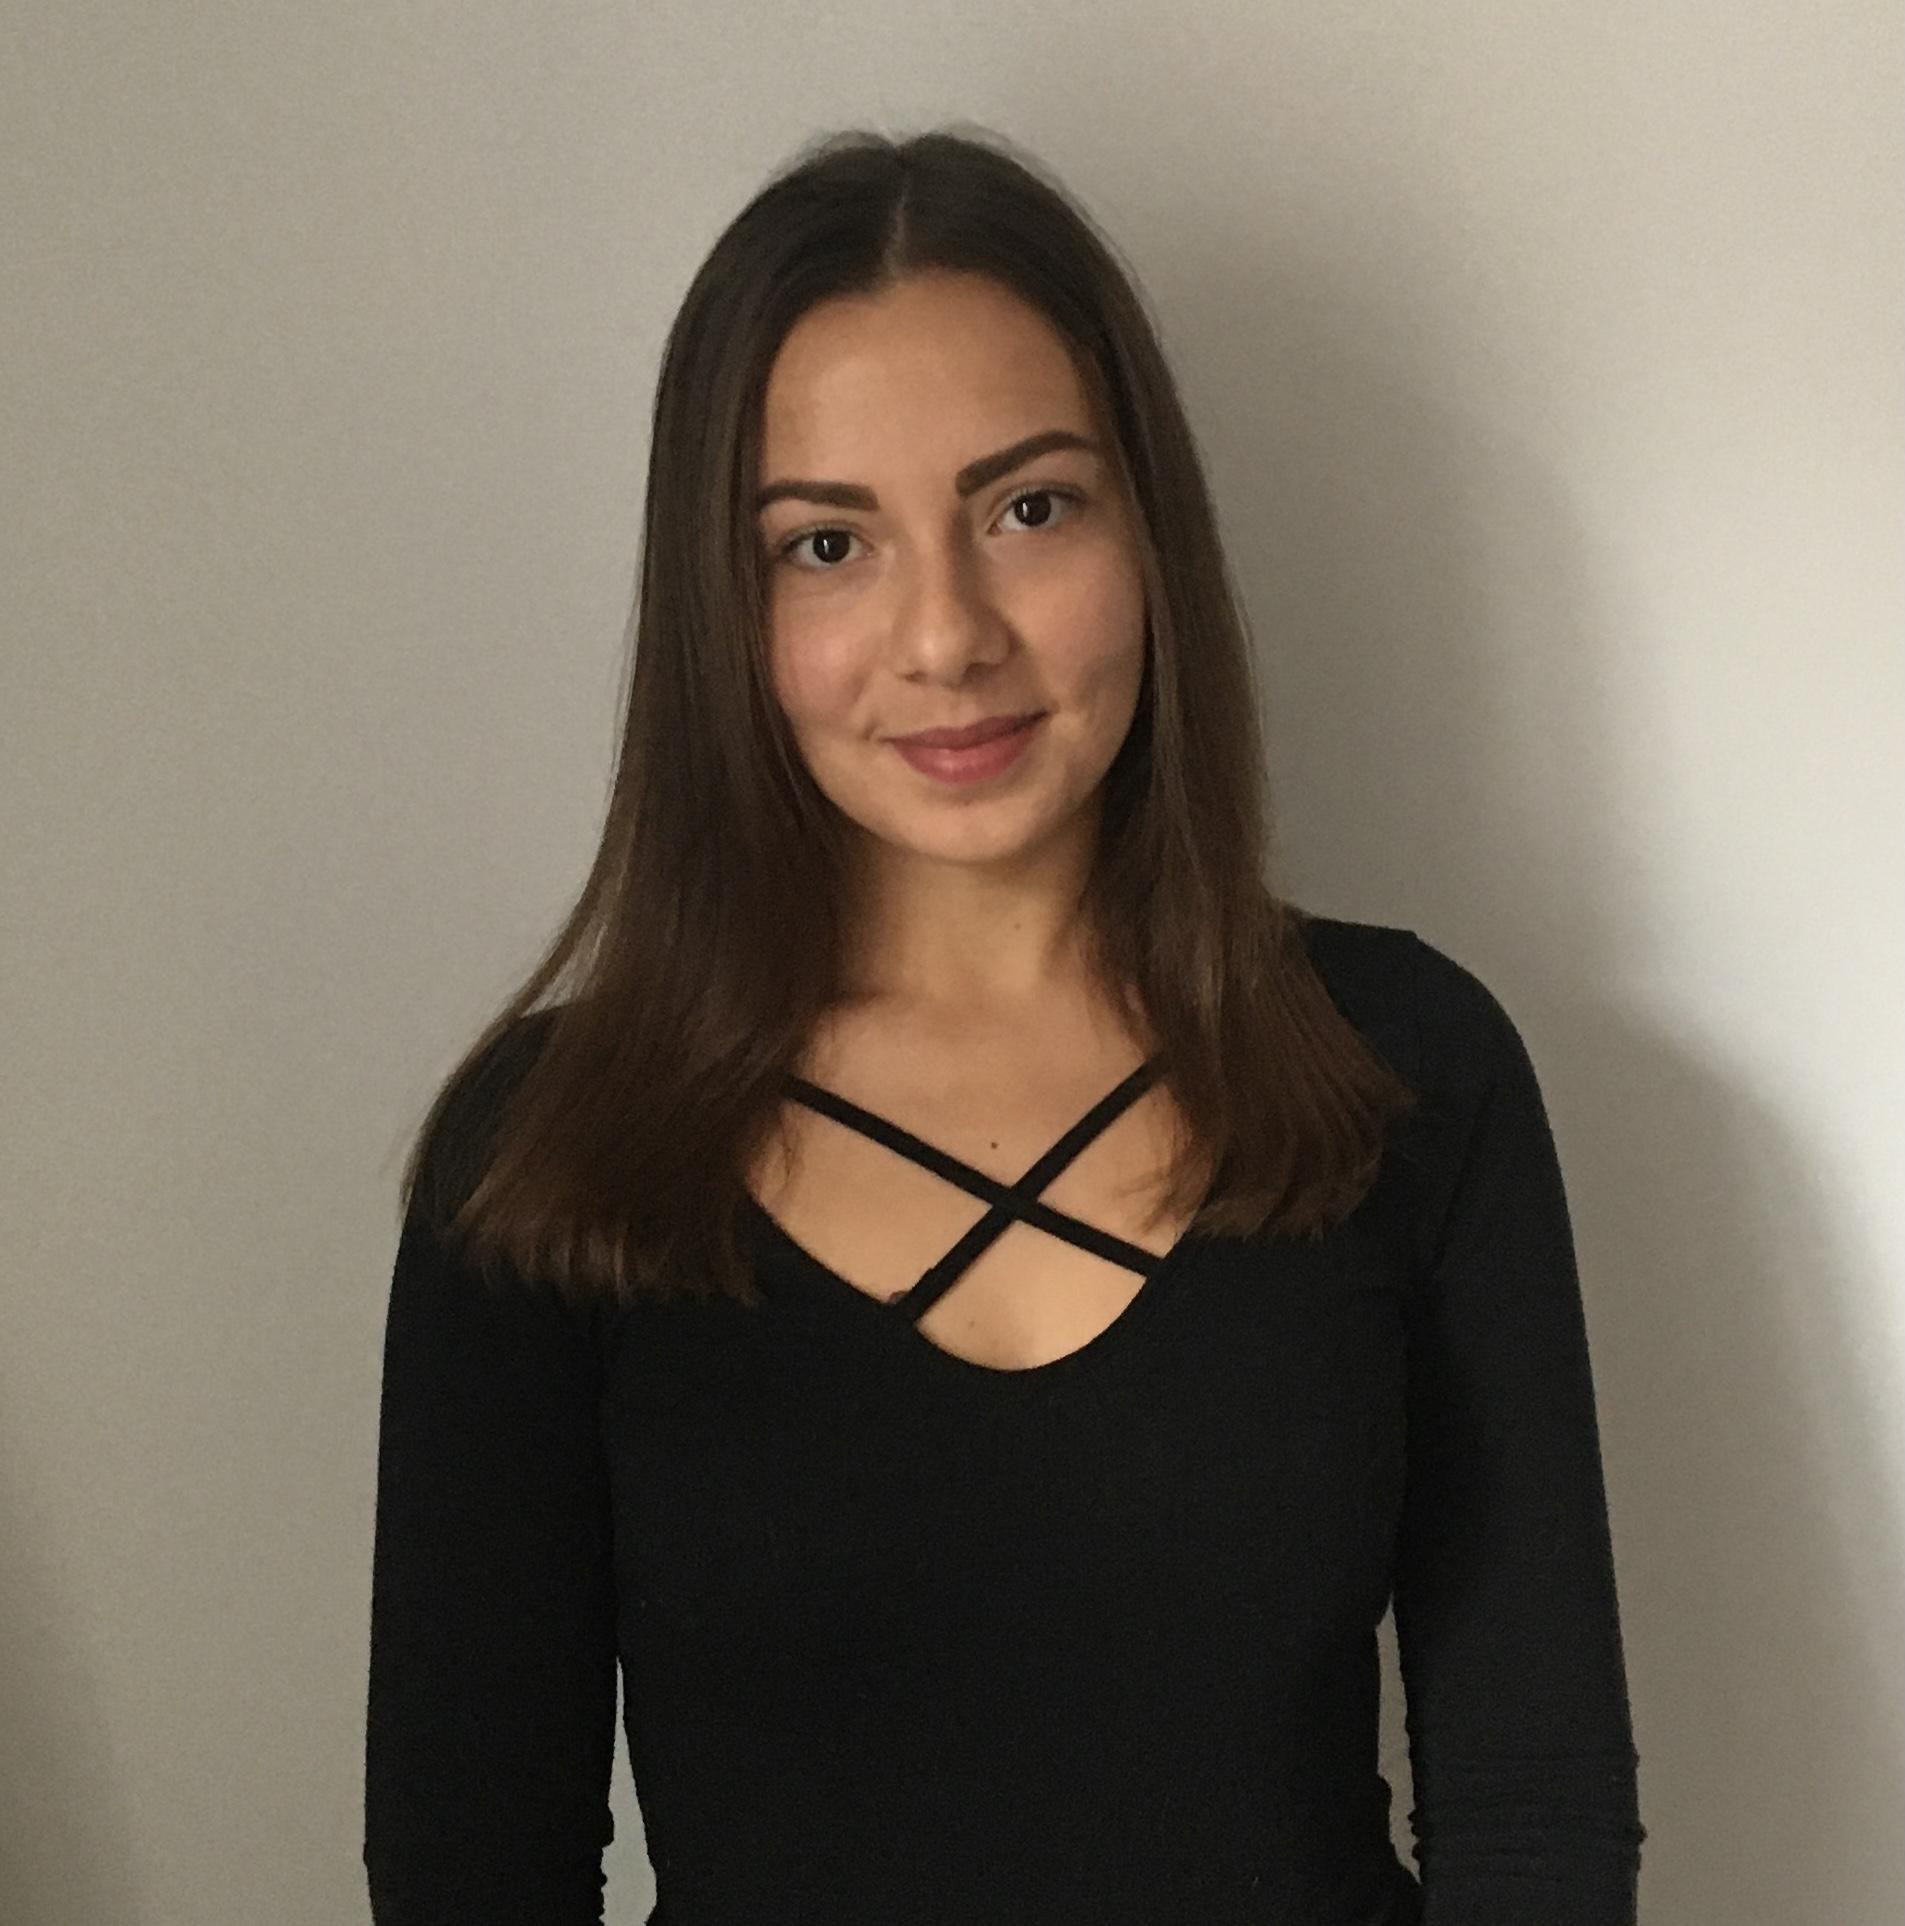 Justine LECLERC